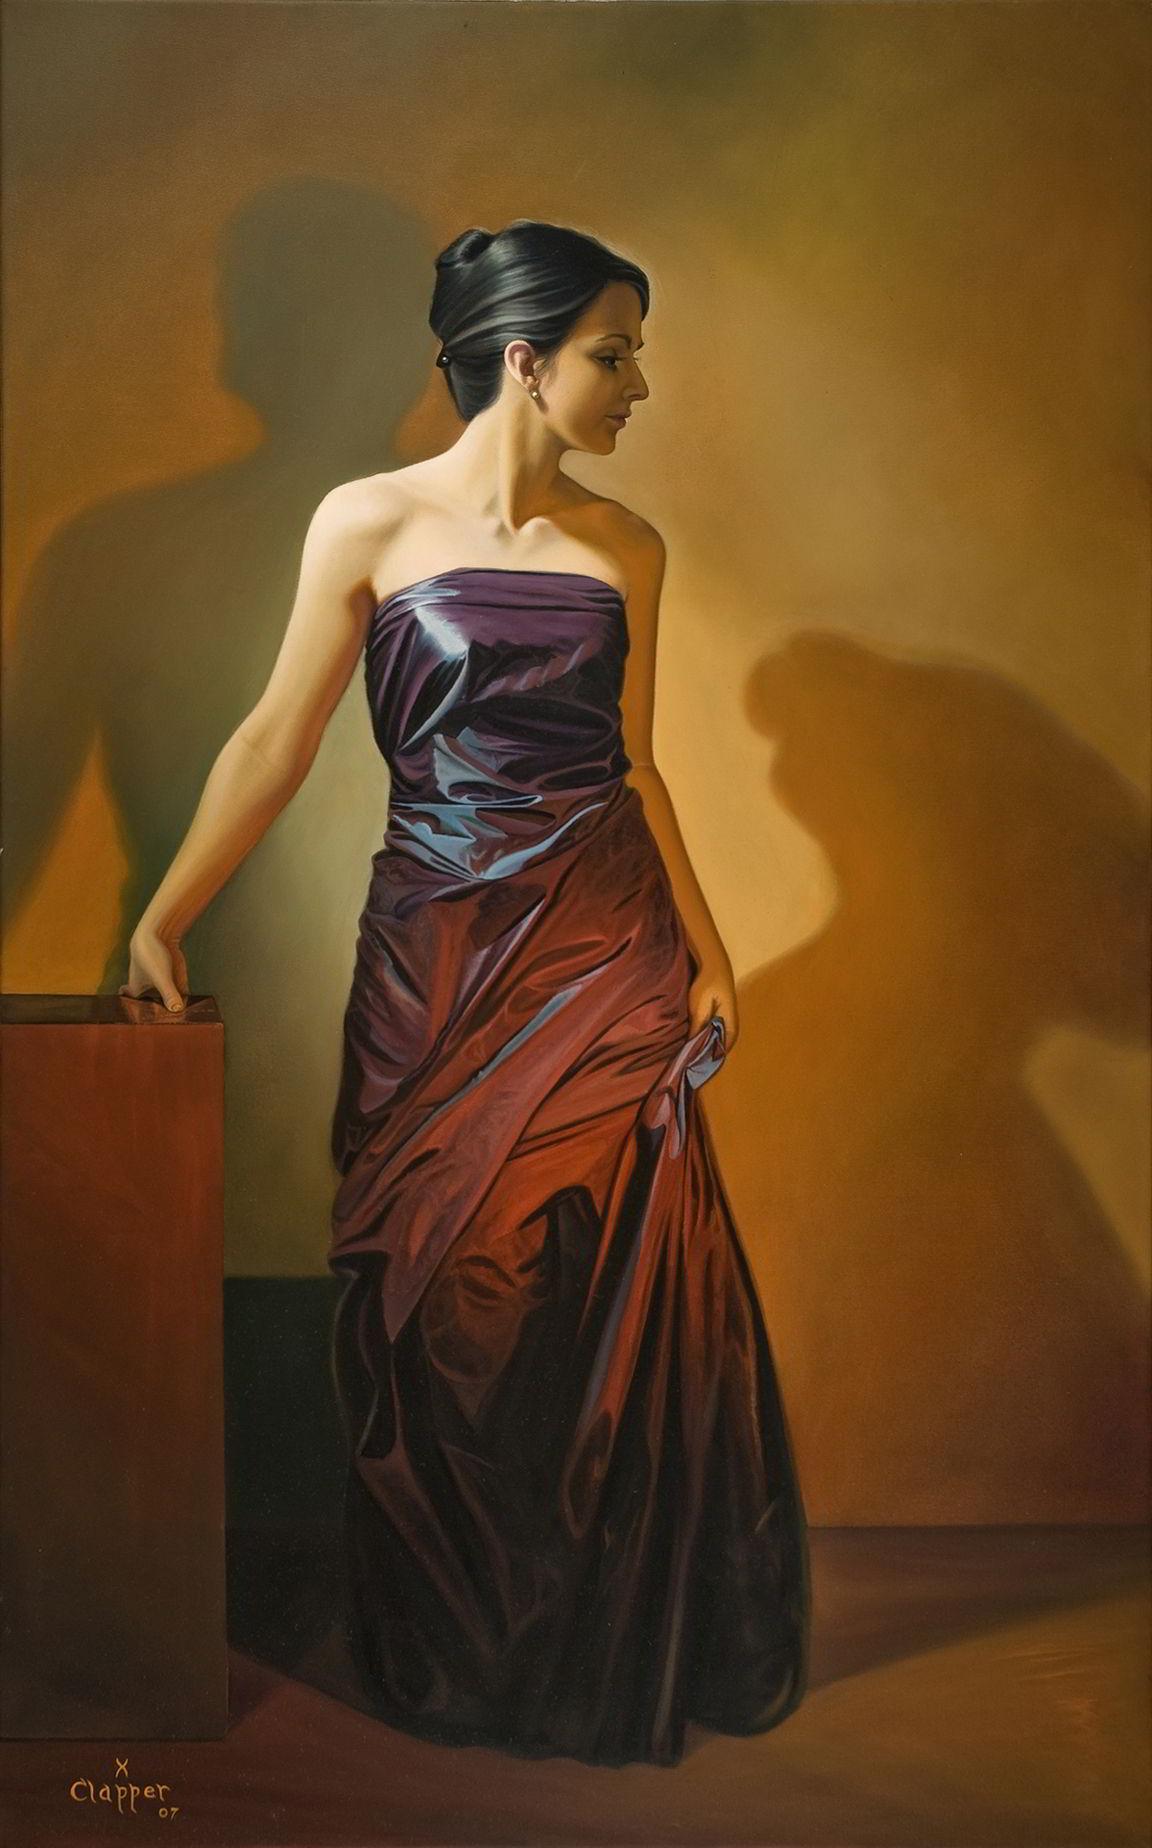 Modern X by Donald Clapper